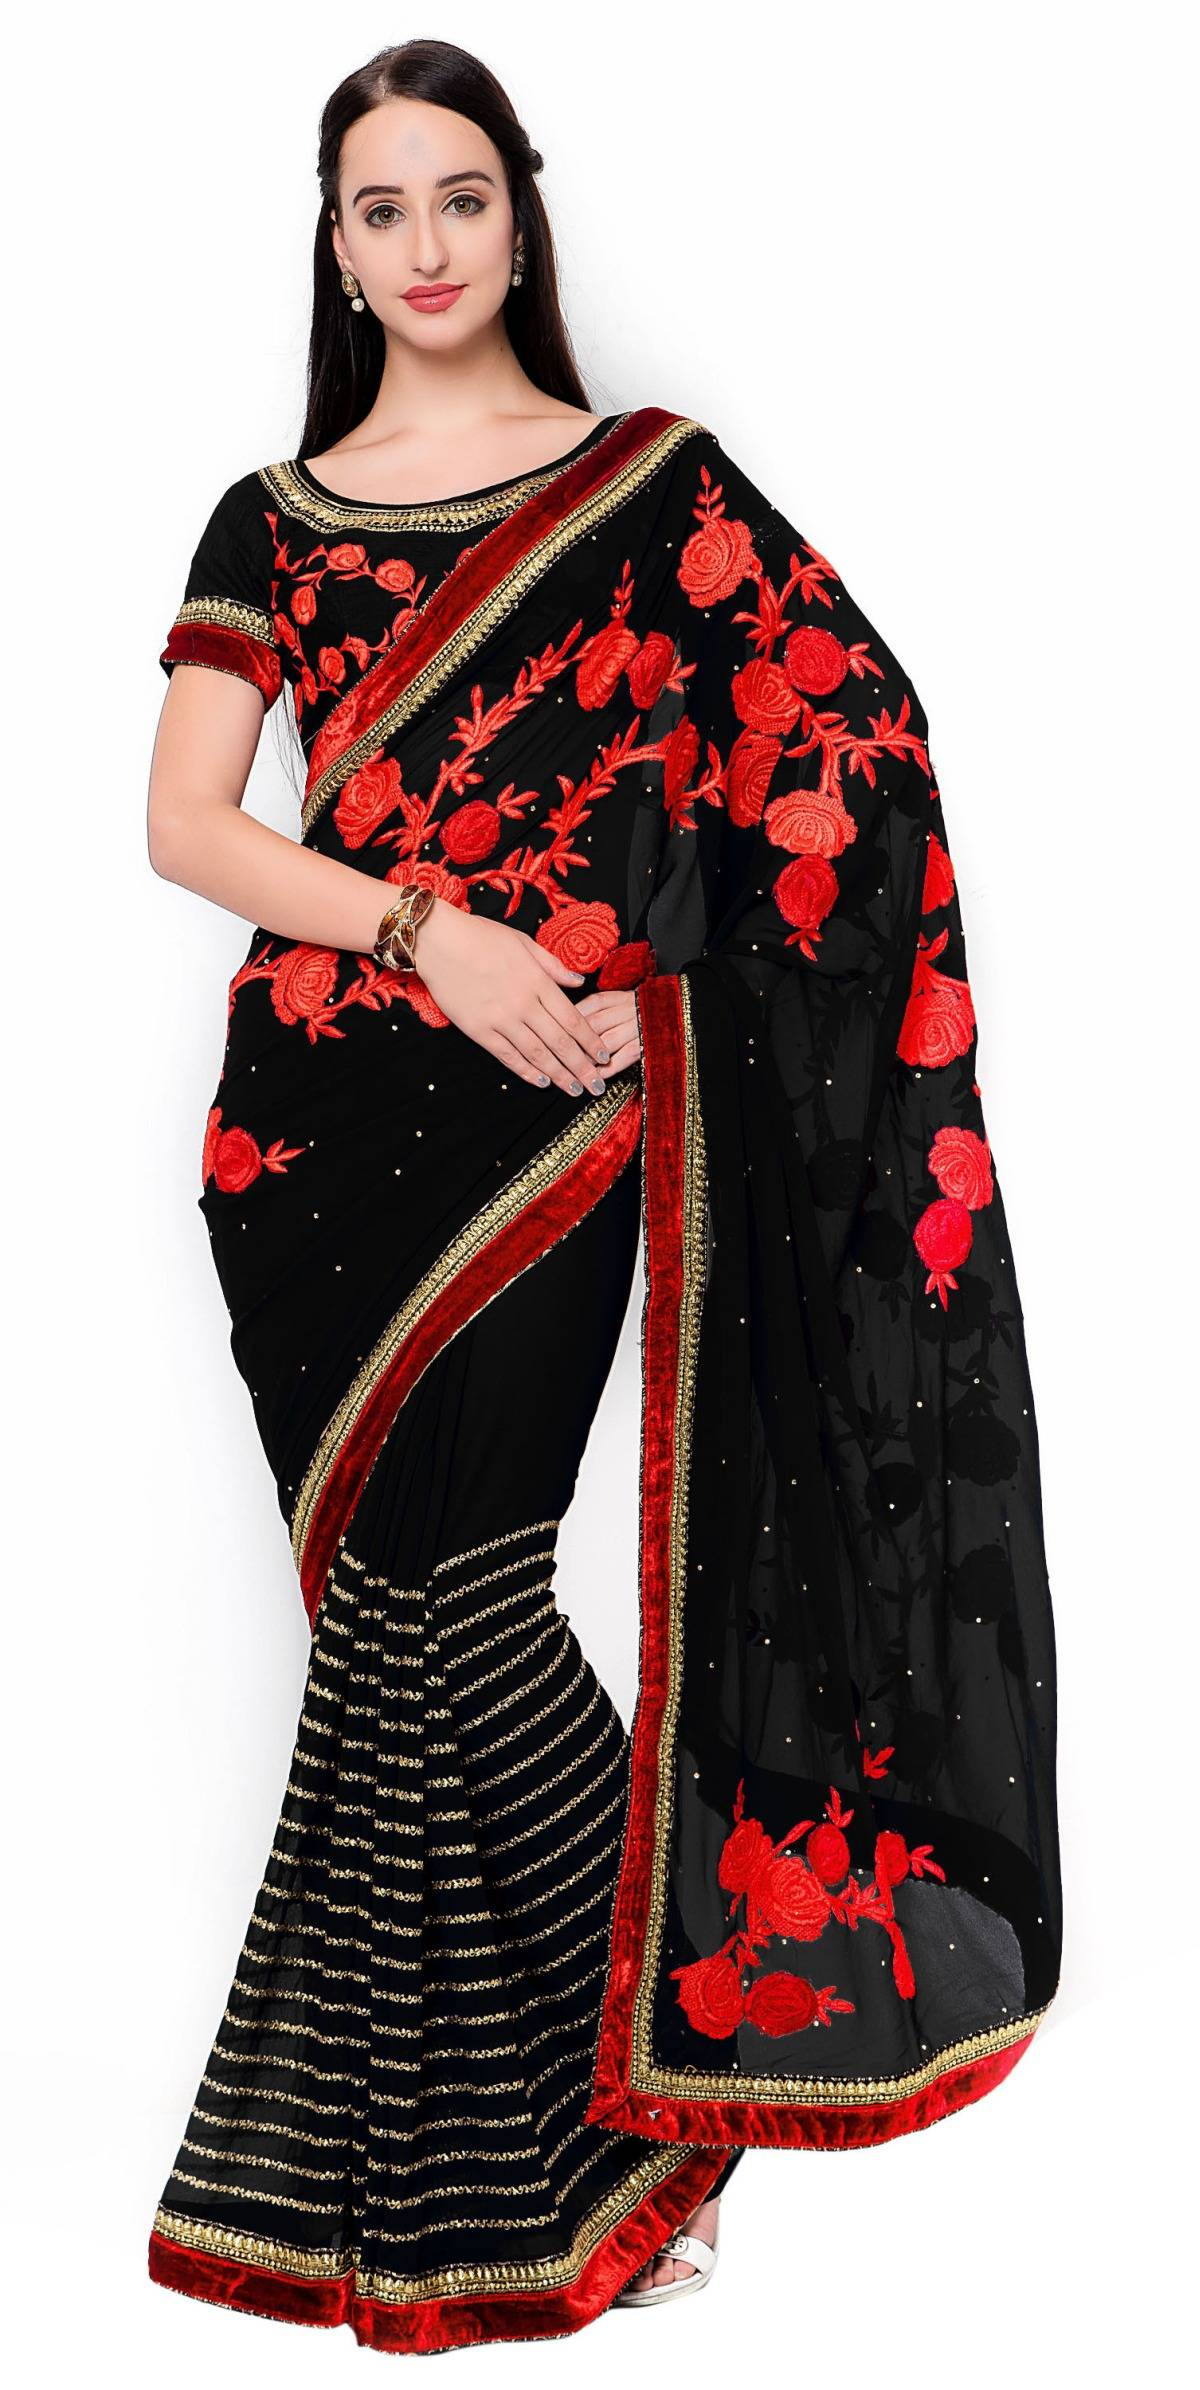 Embroidered Faux Georgette Saree (Sari) in Black